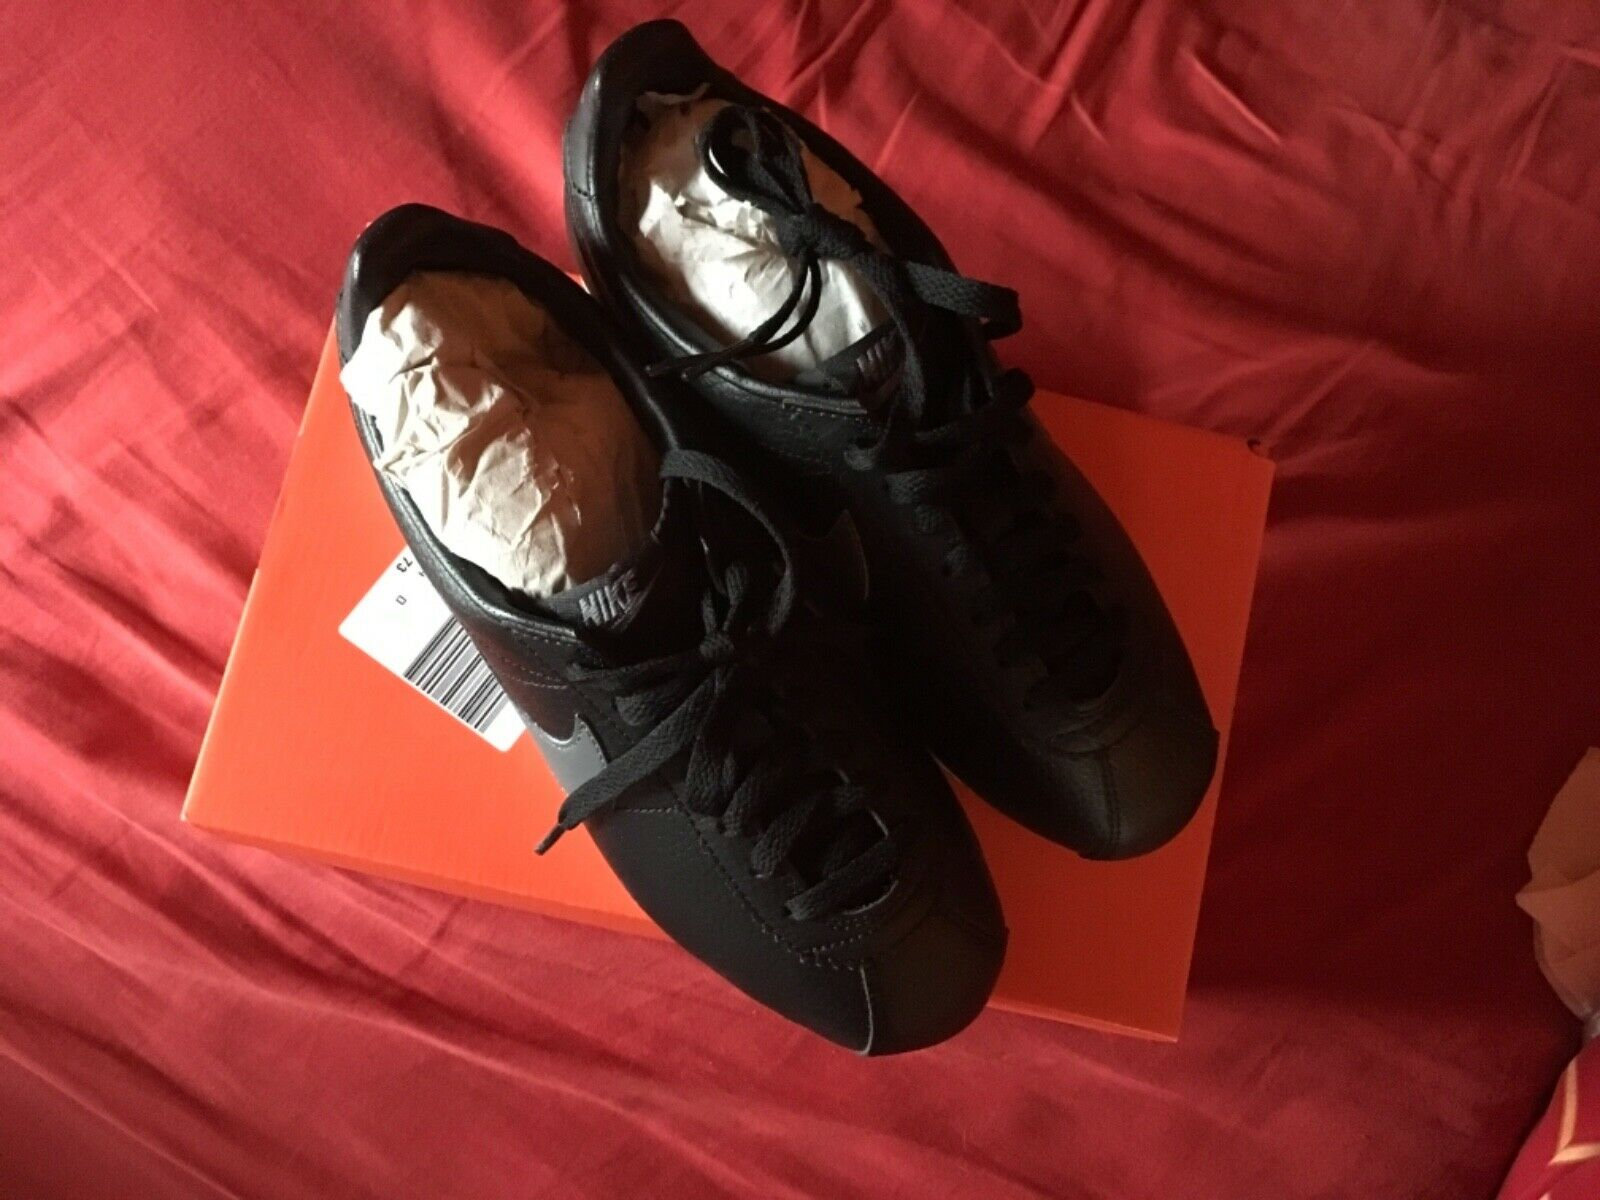 Nike Sportswear Classic Cortez Leather Turnschuhe Einziger Anbieter in Gr. 39 UK6